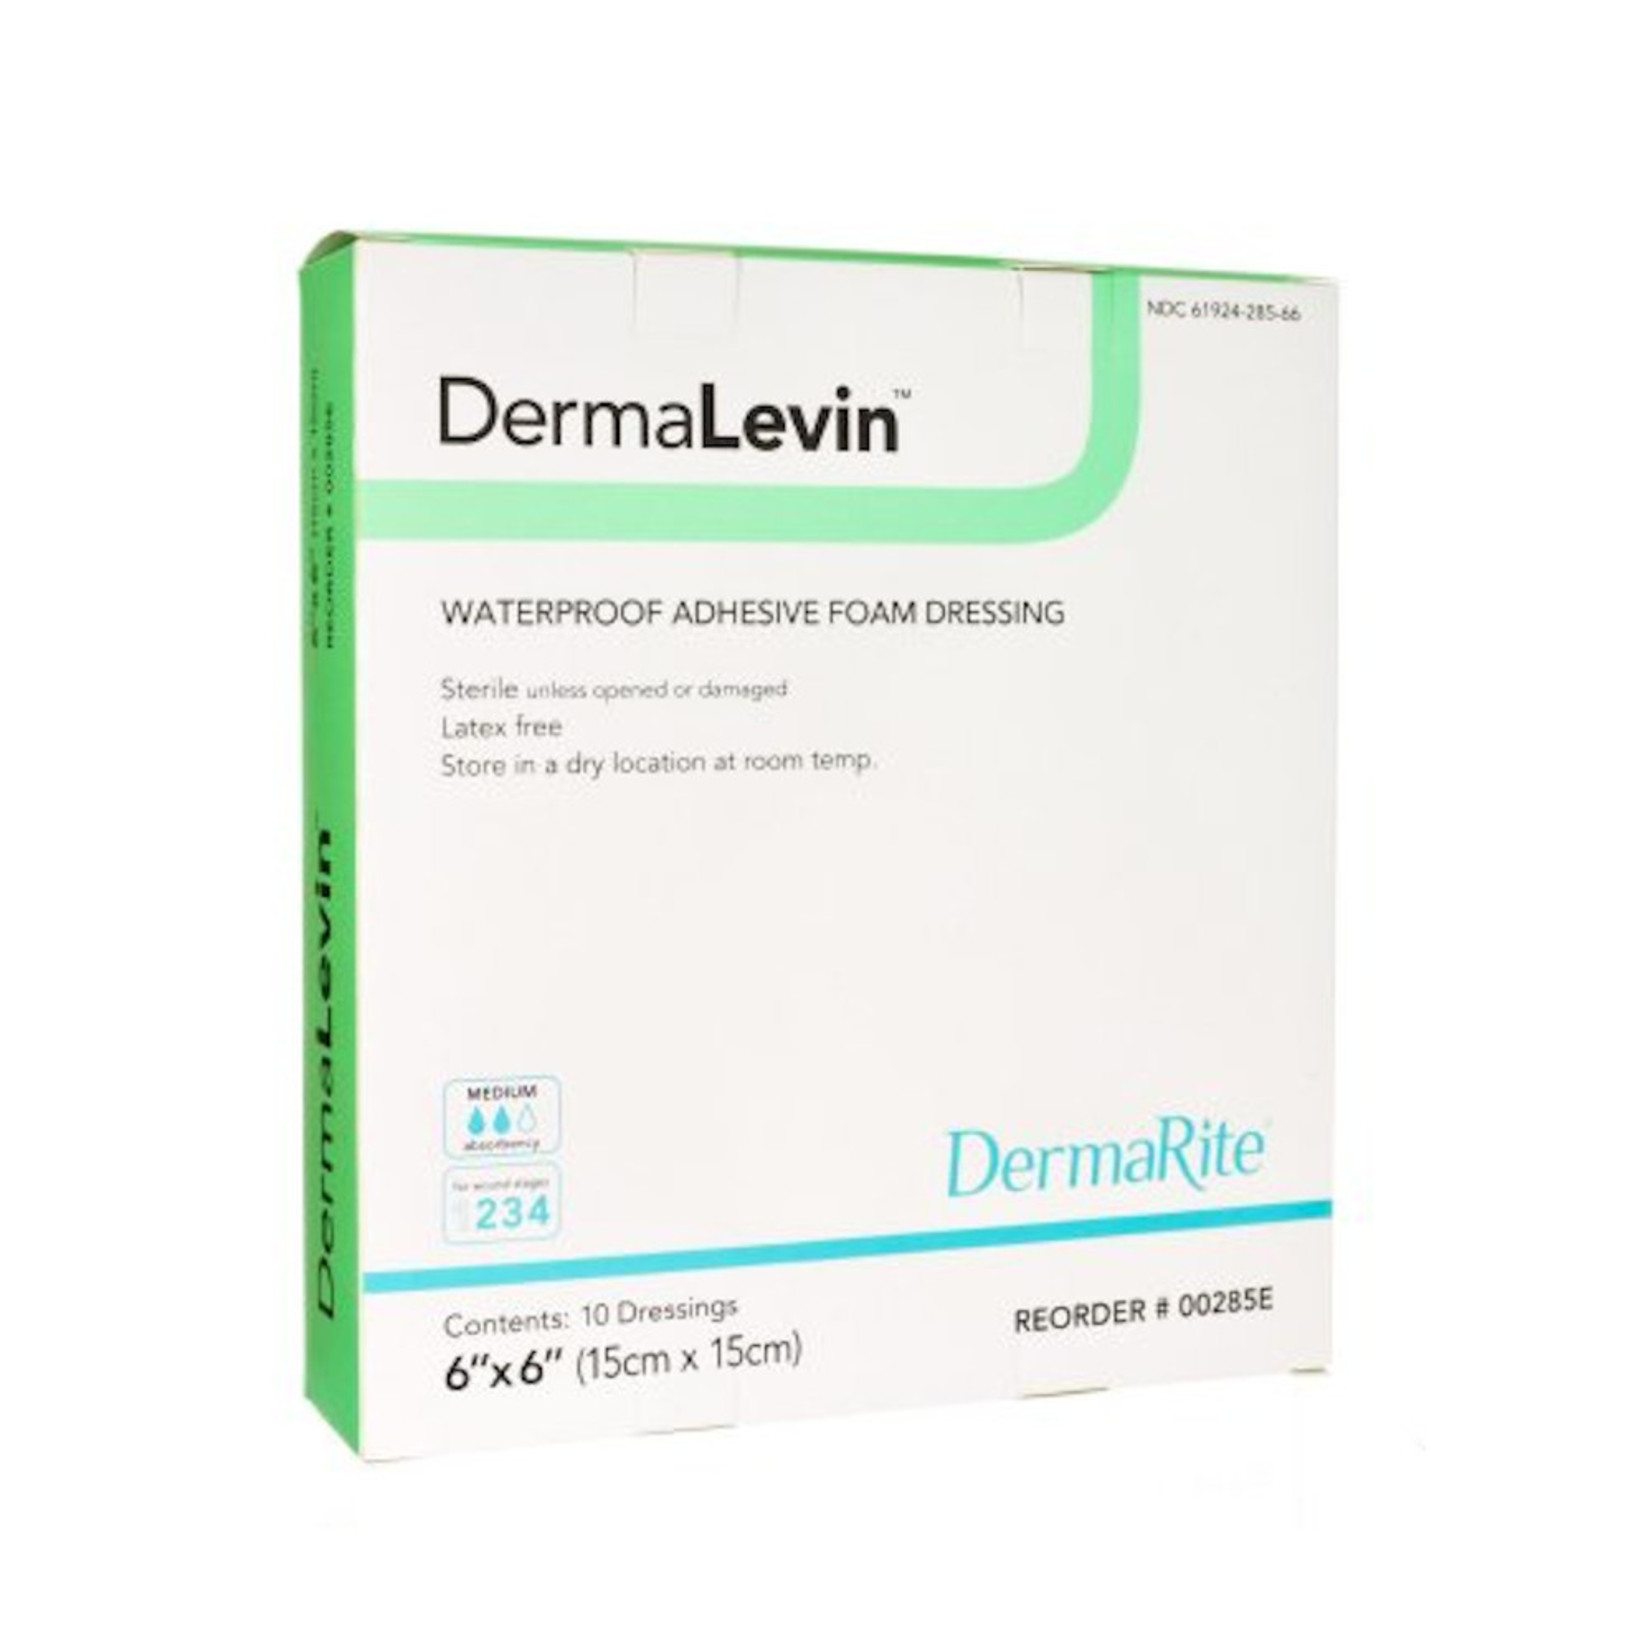 Dermalevin foam 6x6 - Adhesive (56)